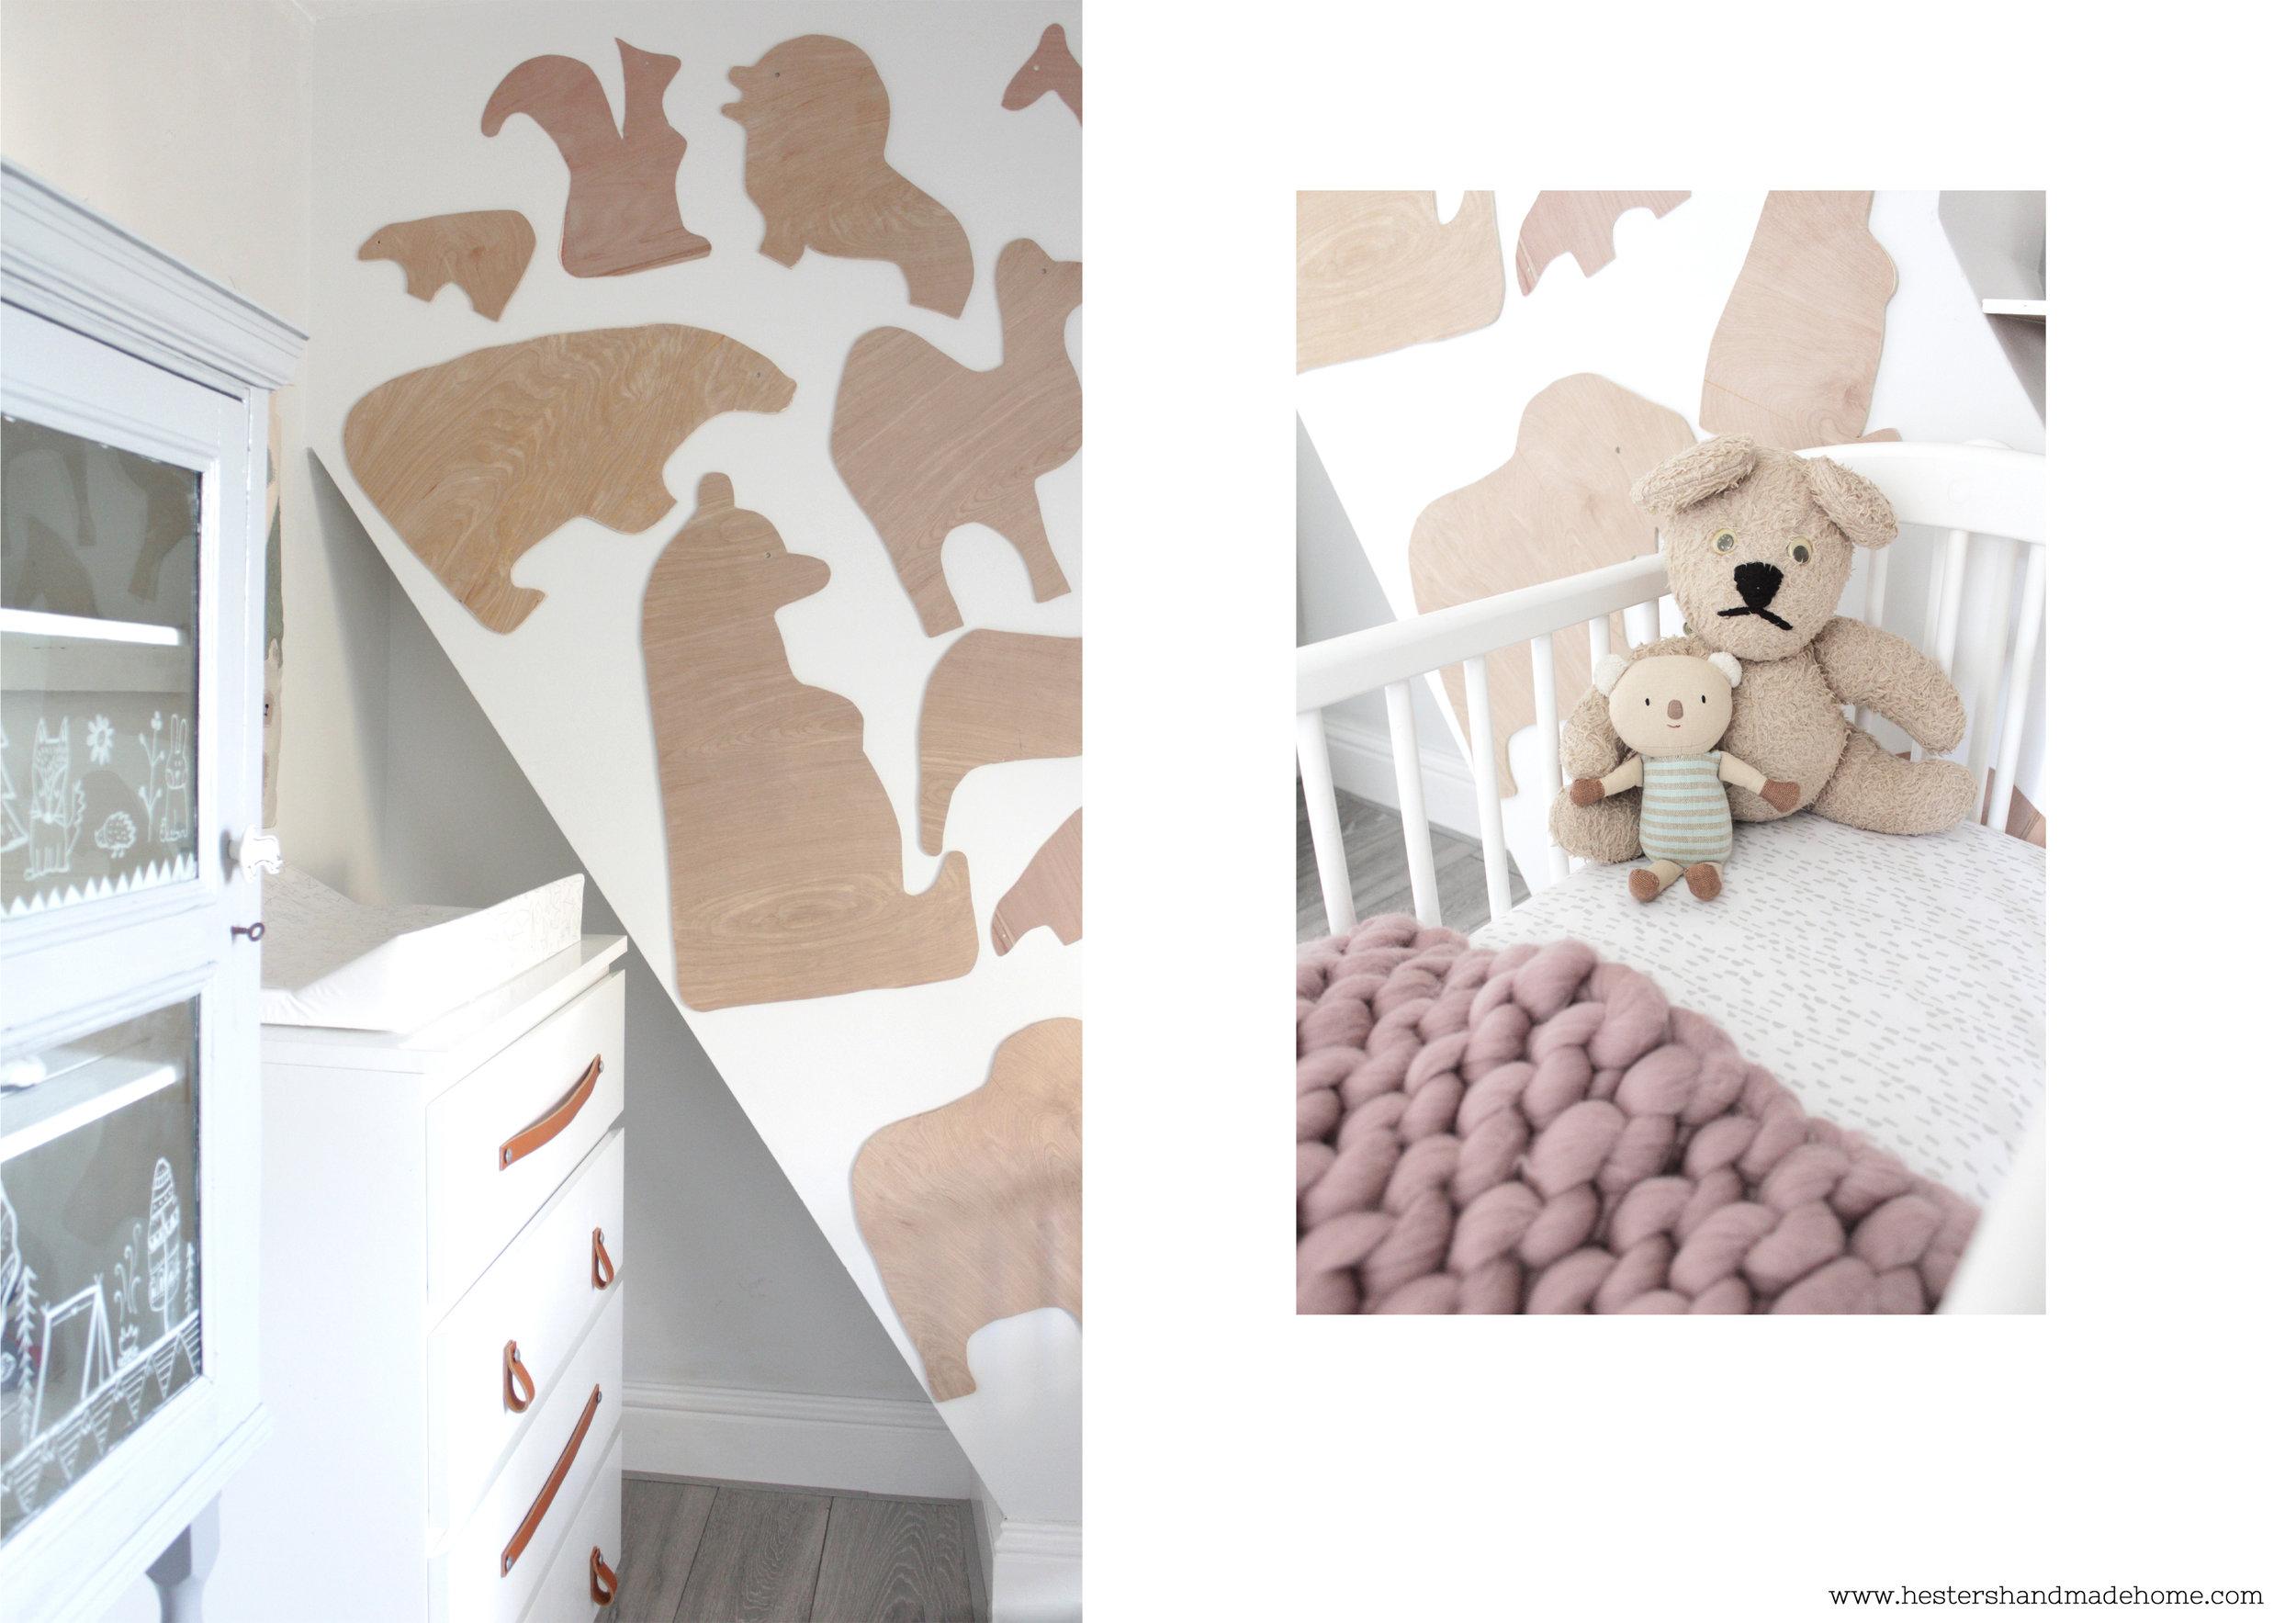 Nursery decor, plywood accent wall tutorial by www.hestershandmadehome.com